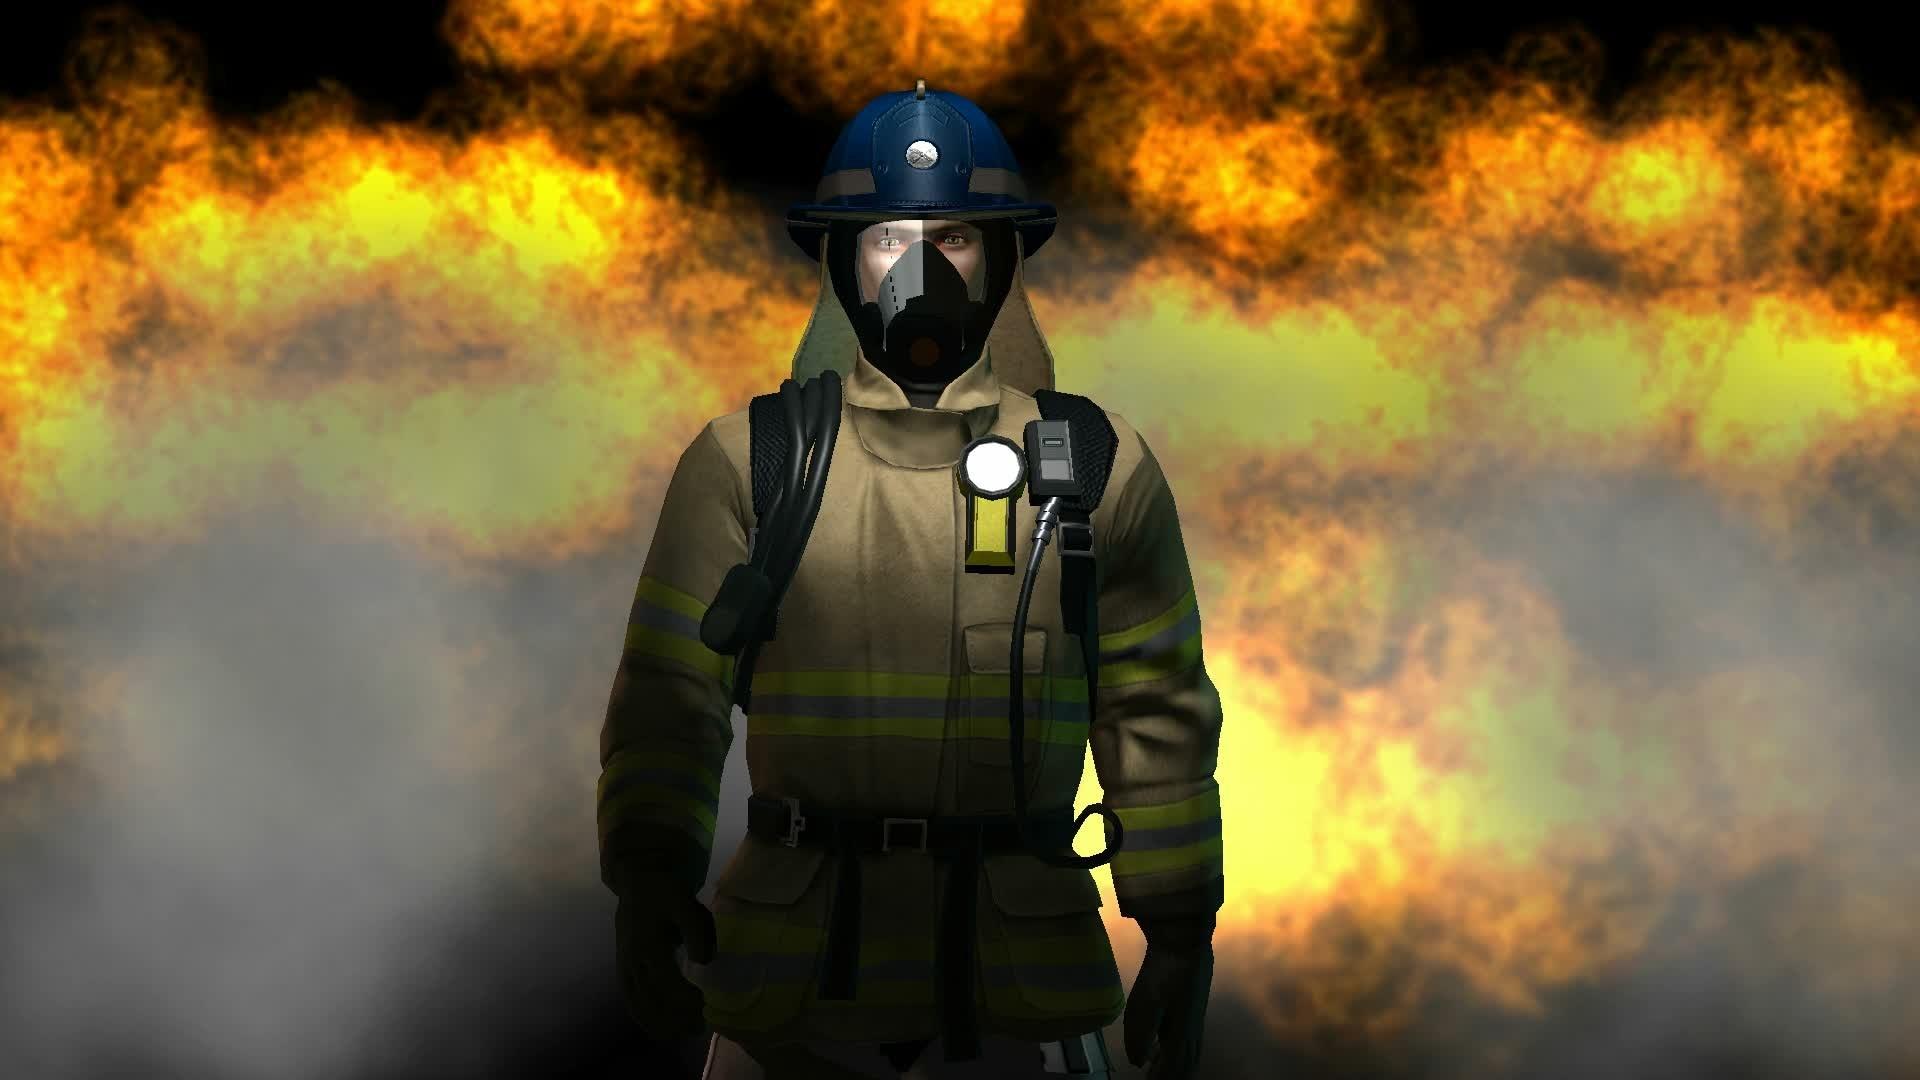 Fireman Wallpaper ·① WallpaperTag